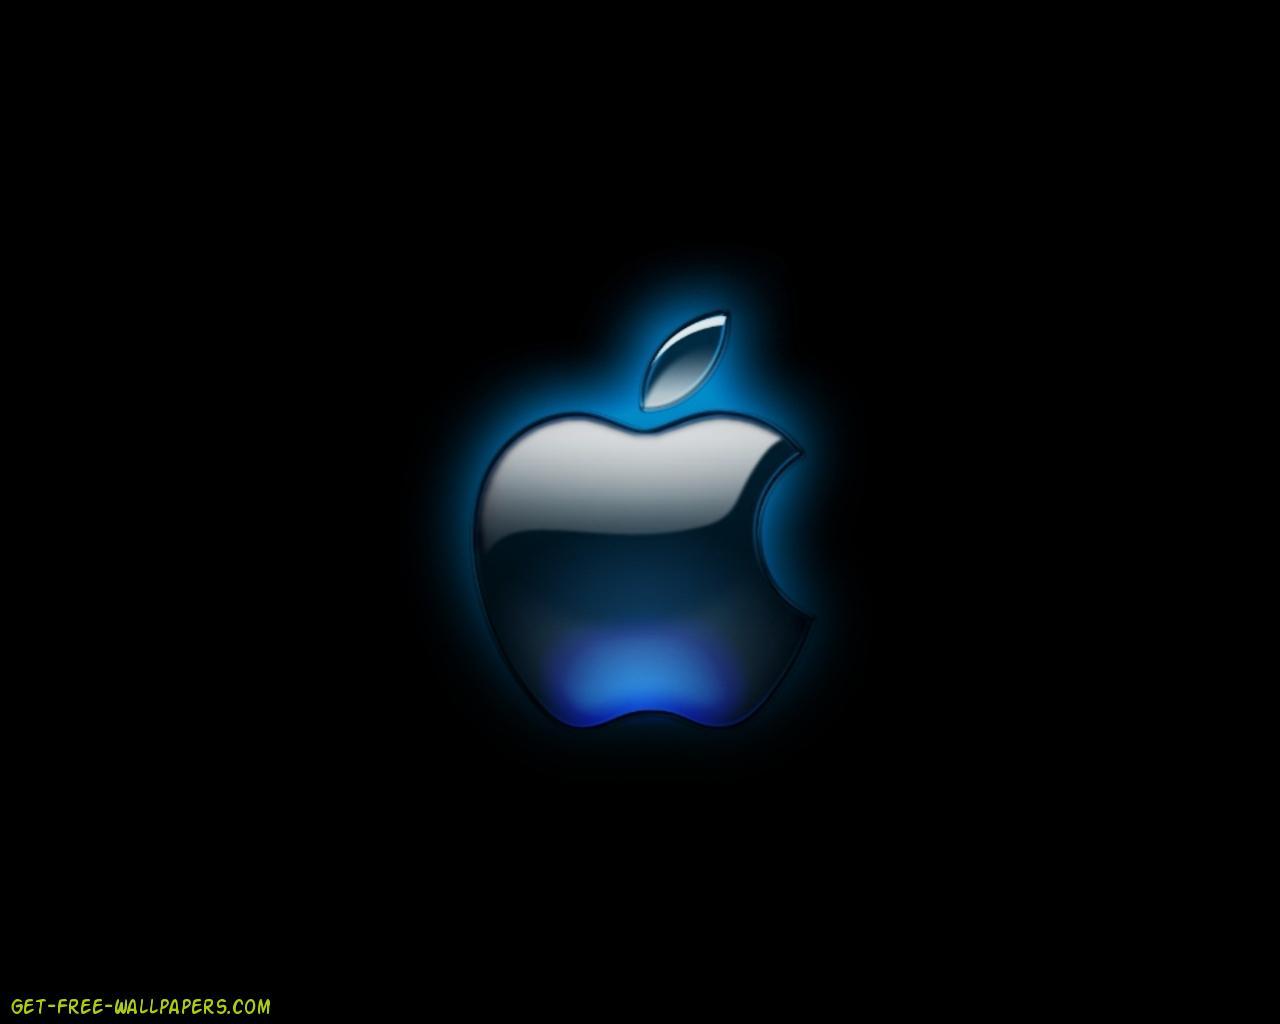 free download cool black apple logo wallpaper 1280x1024